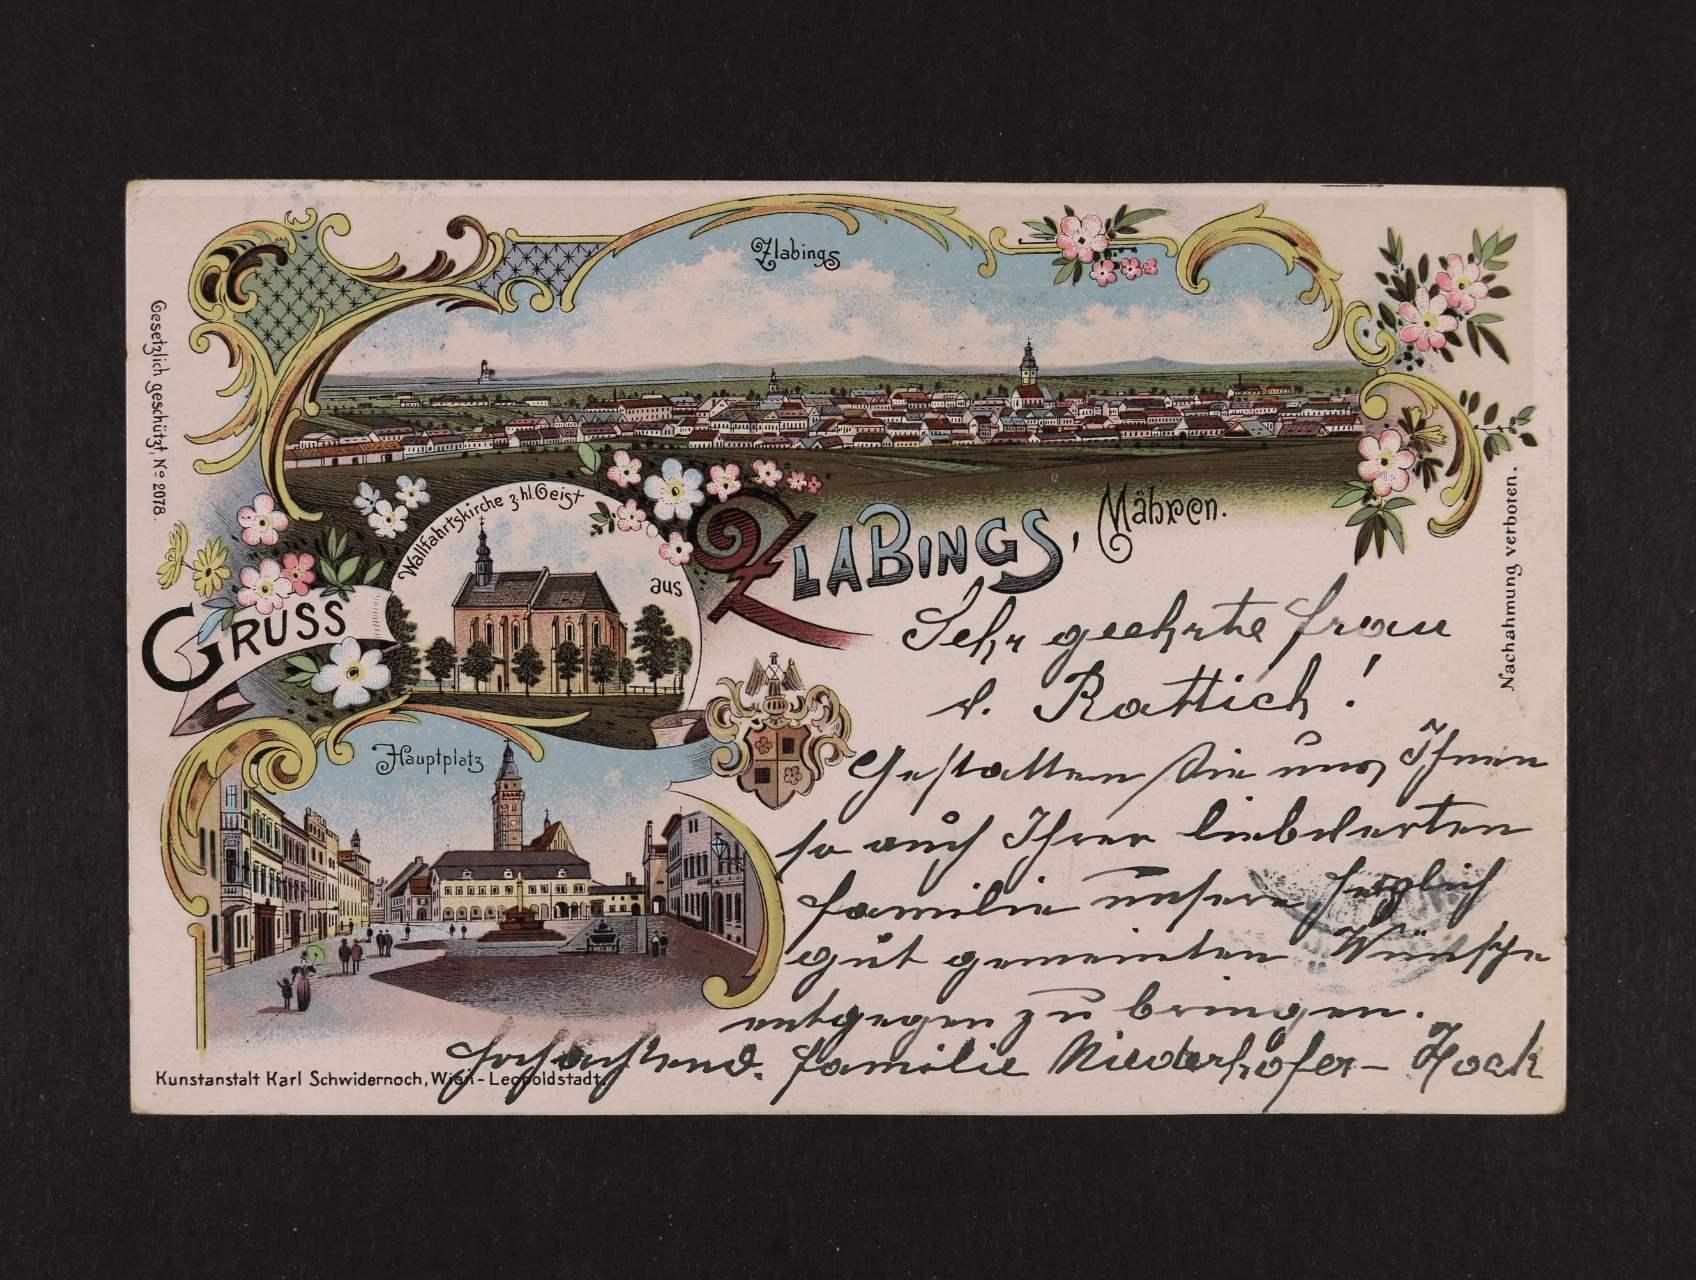 Slavonice - bar. litograf. koláž, použitá 1898, dobrá kvalita